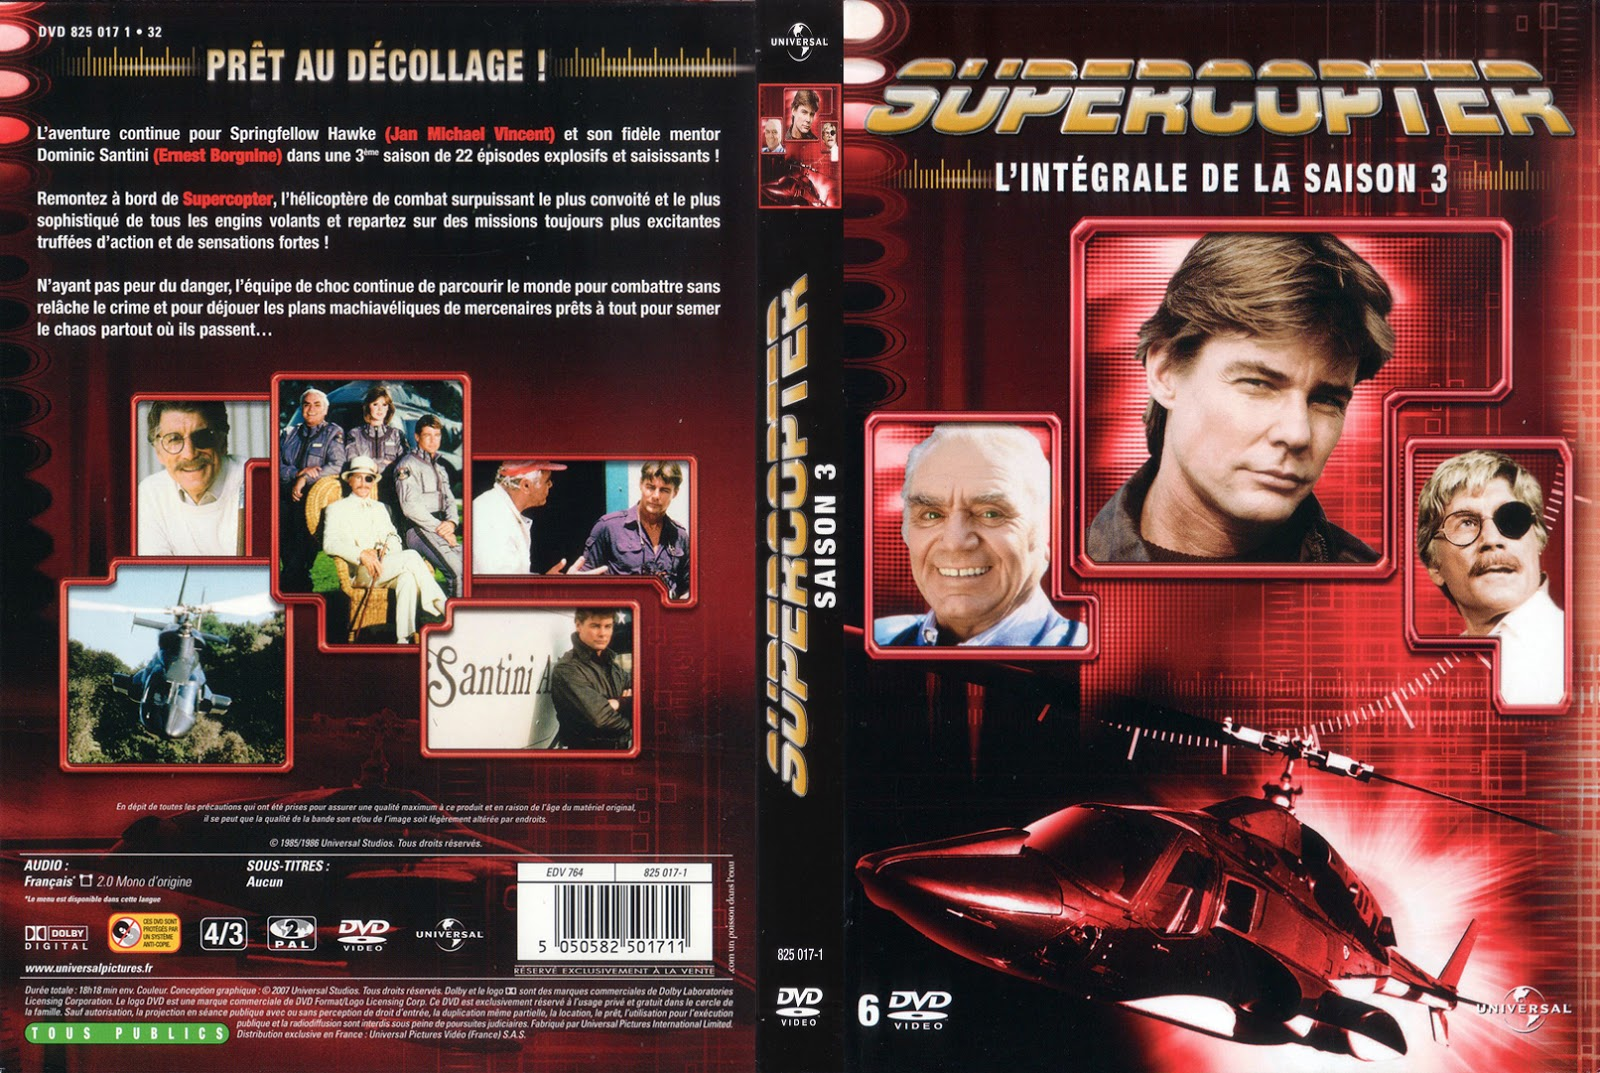 FILM TÉLÉCHARGER SUPERCOPTER